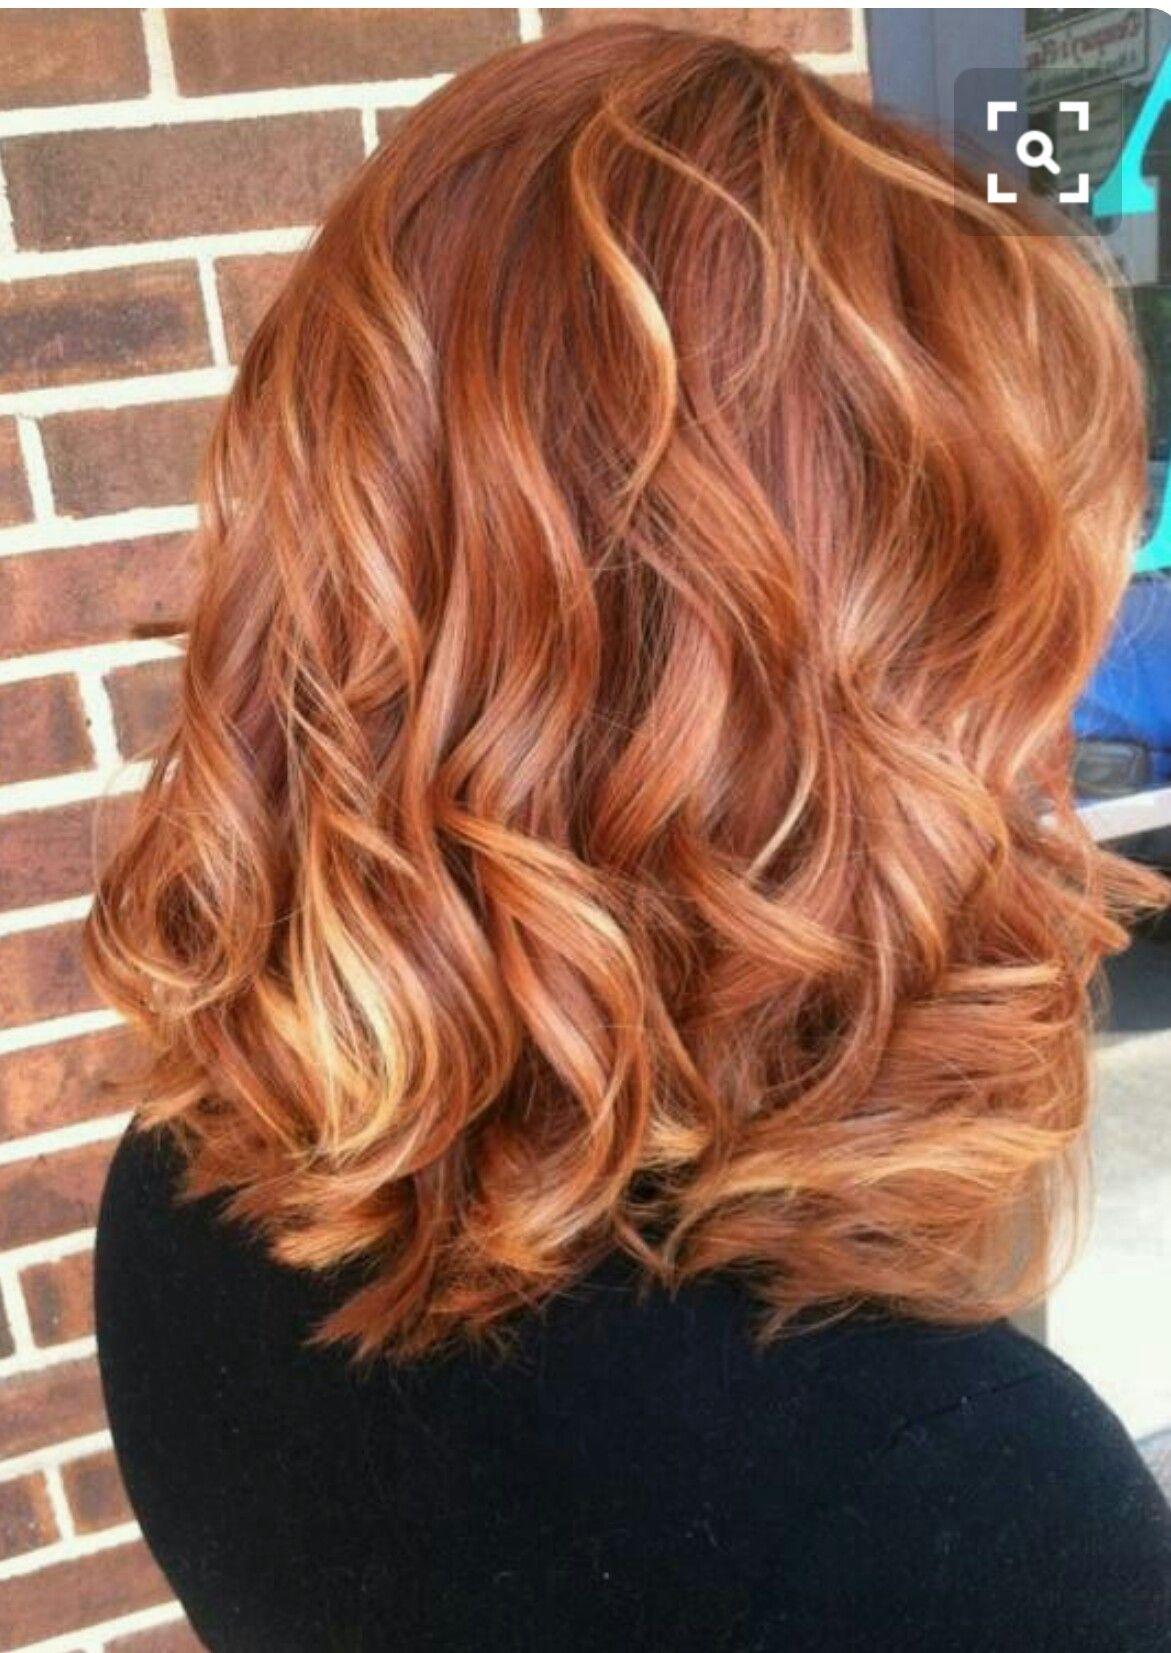 I love that hair color hair pinterest hair coloring hair